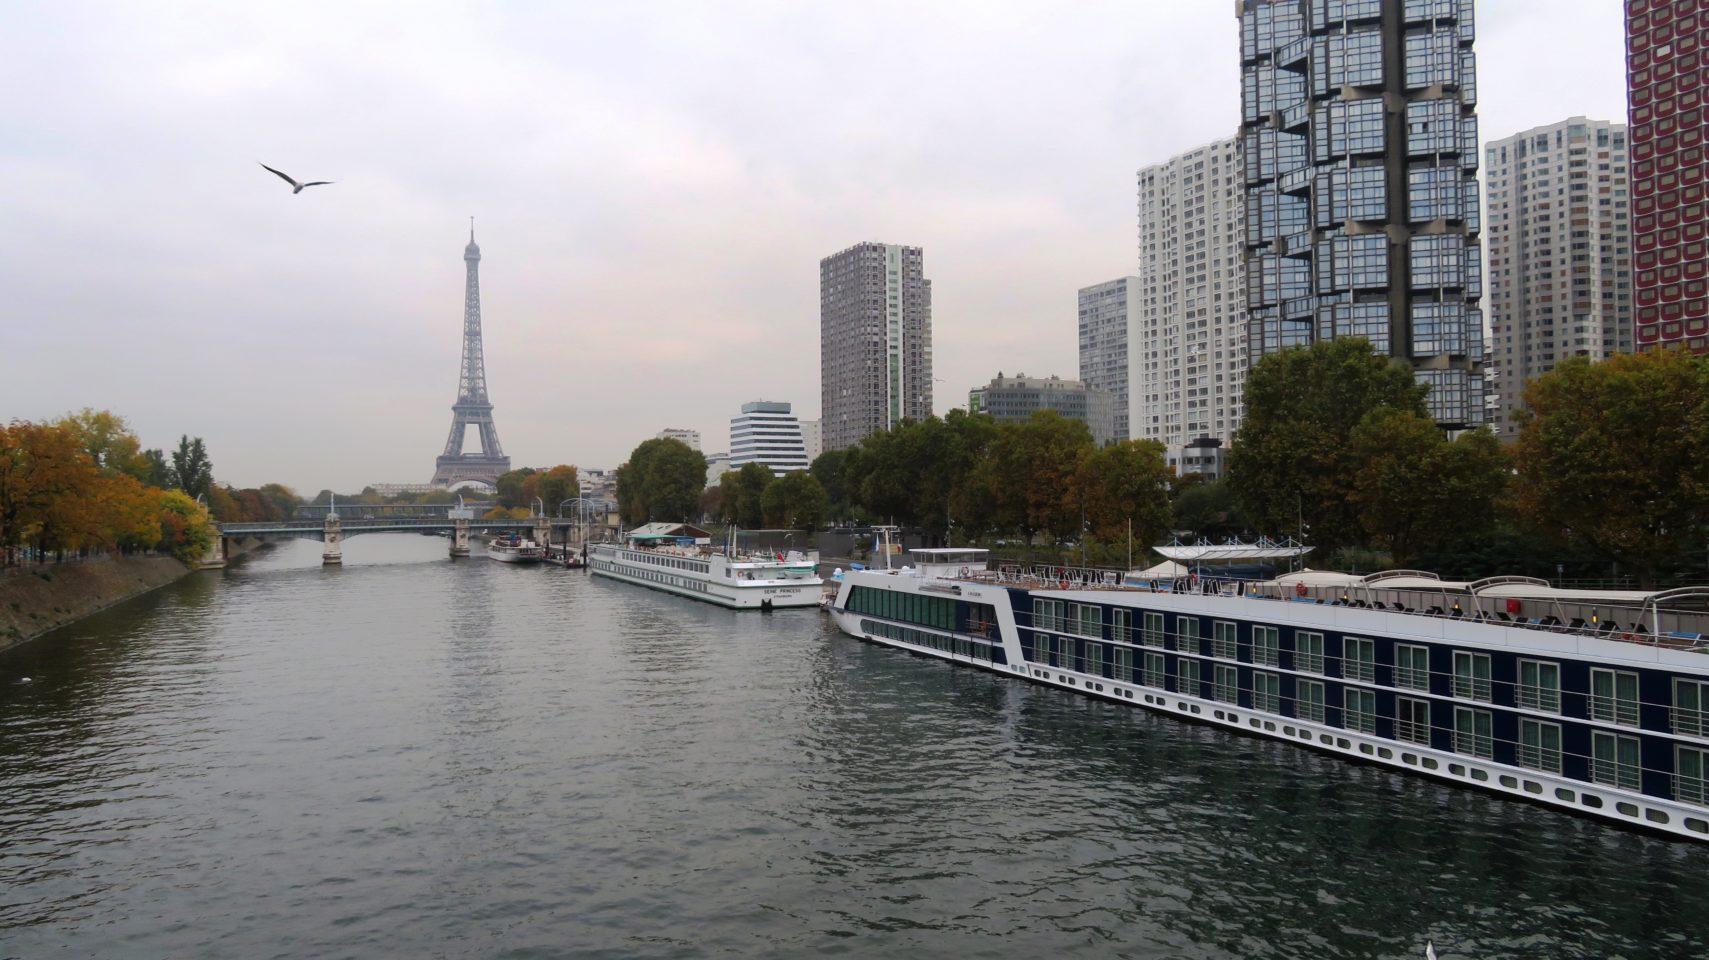 AmaLegro River Cruise Ship Docked in Paris, France ~ Paris and Normandie AMAWaterways Cruise